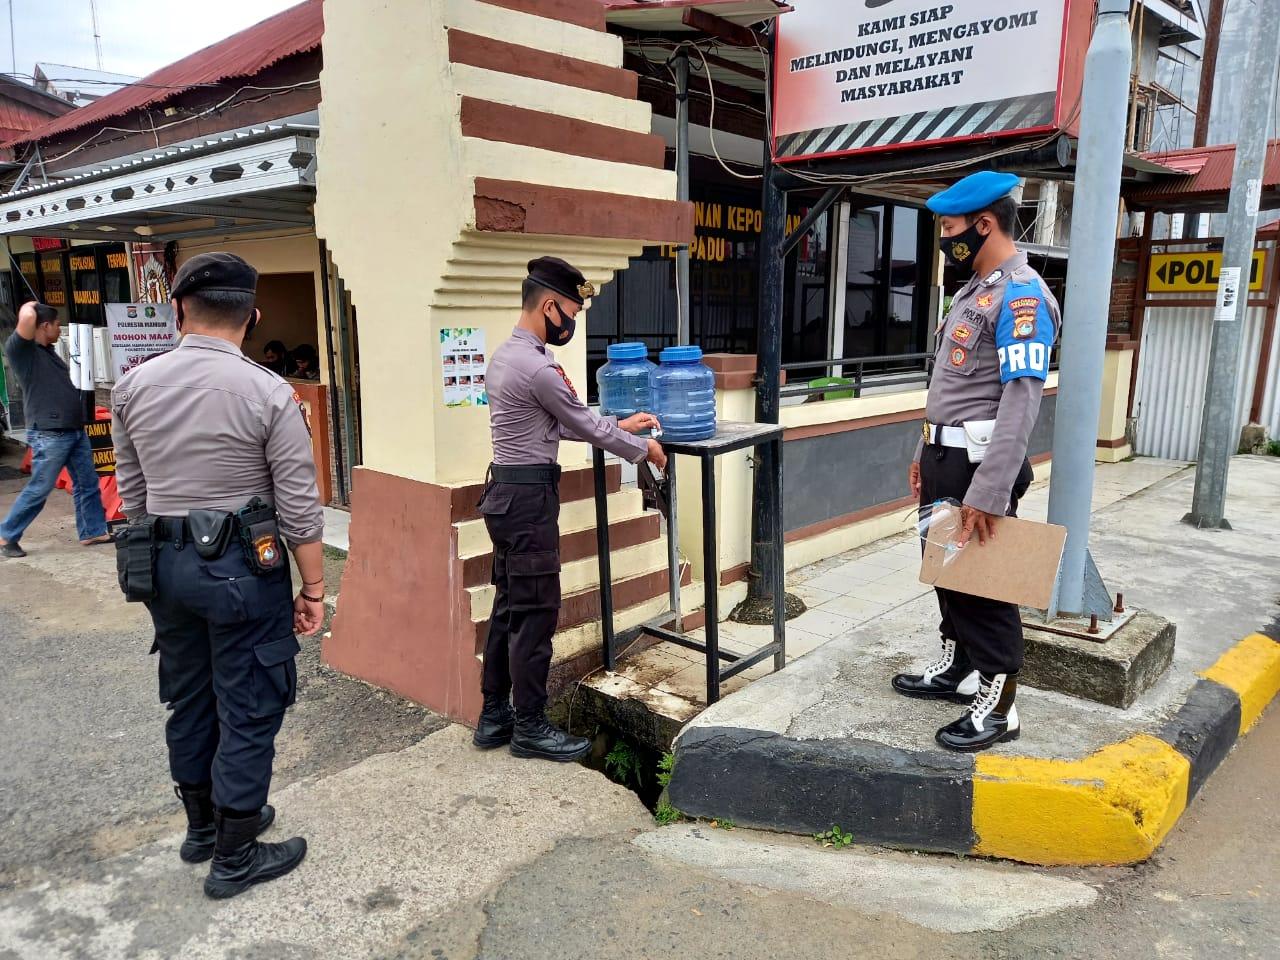 Dokpol Bersama Provost Polresta Mamuju Rutin Terapkan Protokol Kesehatan